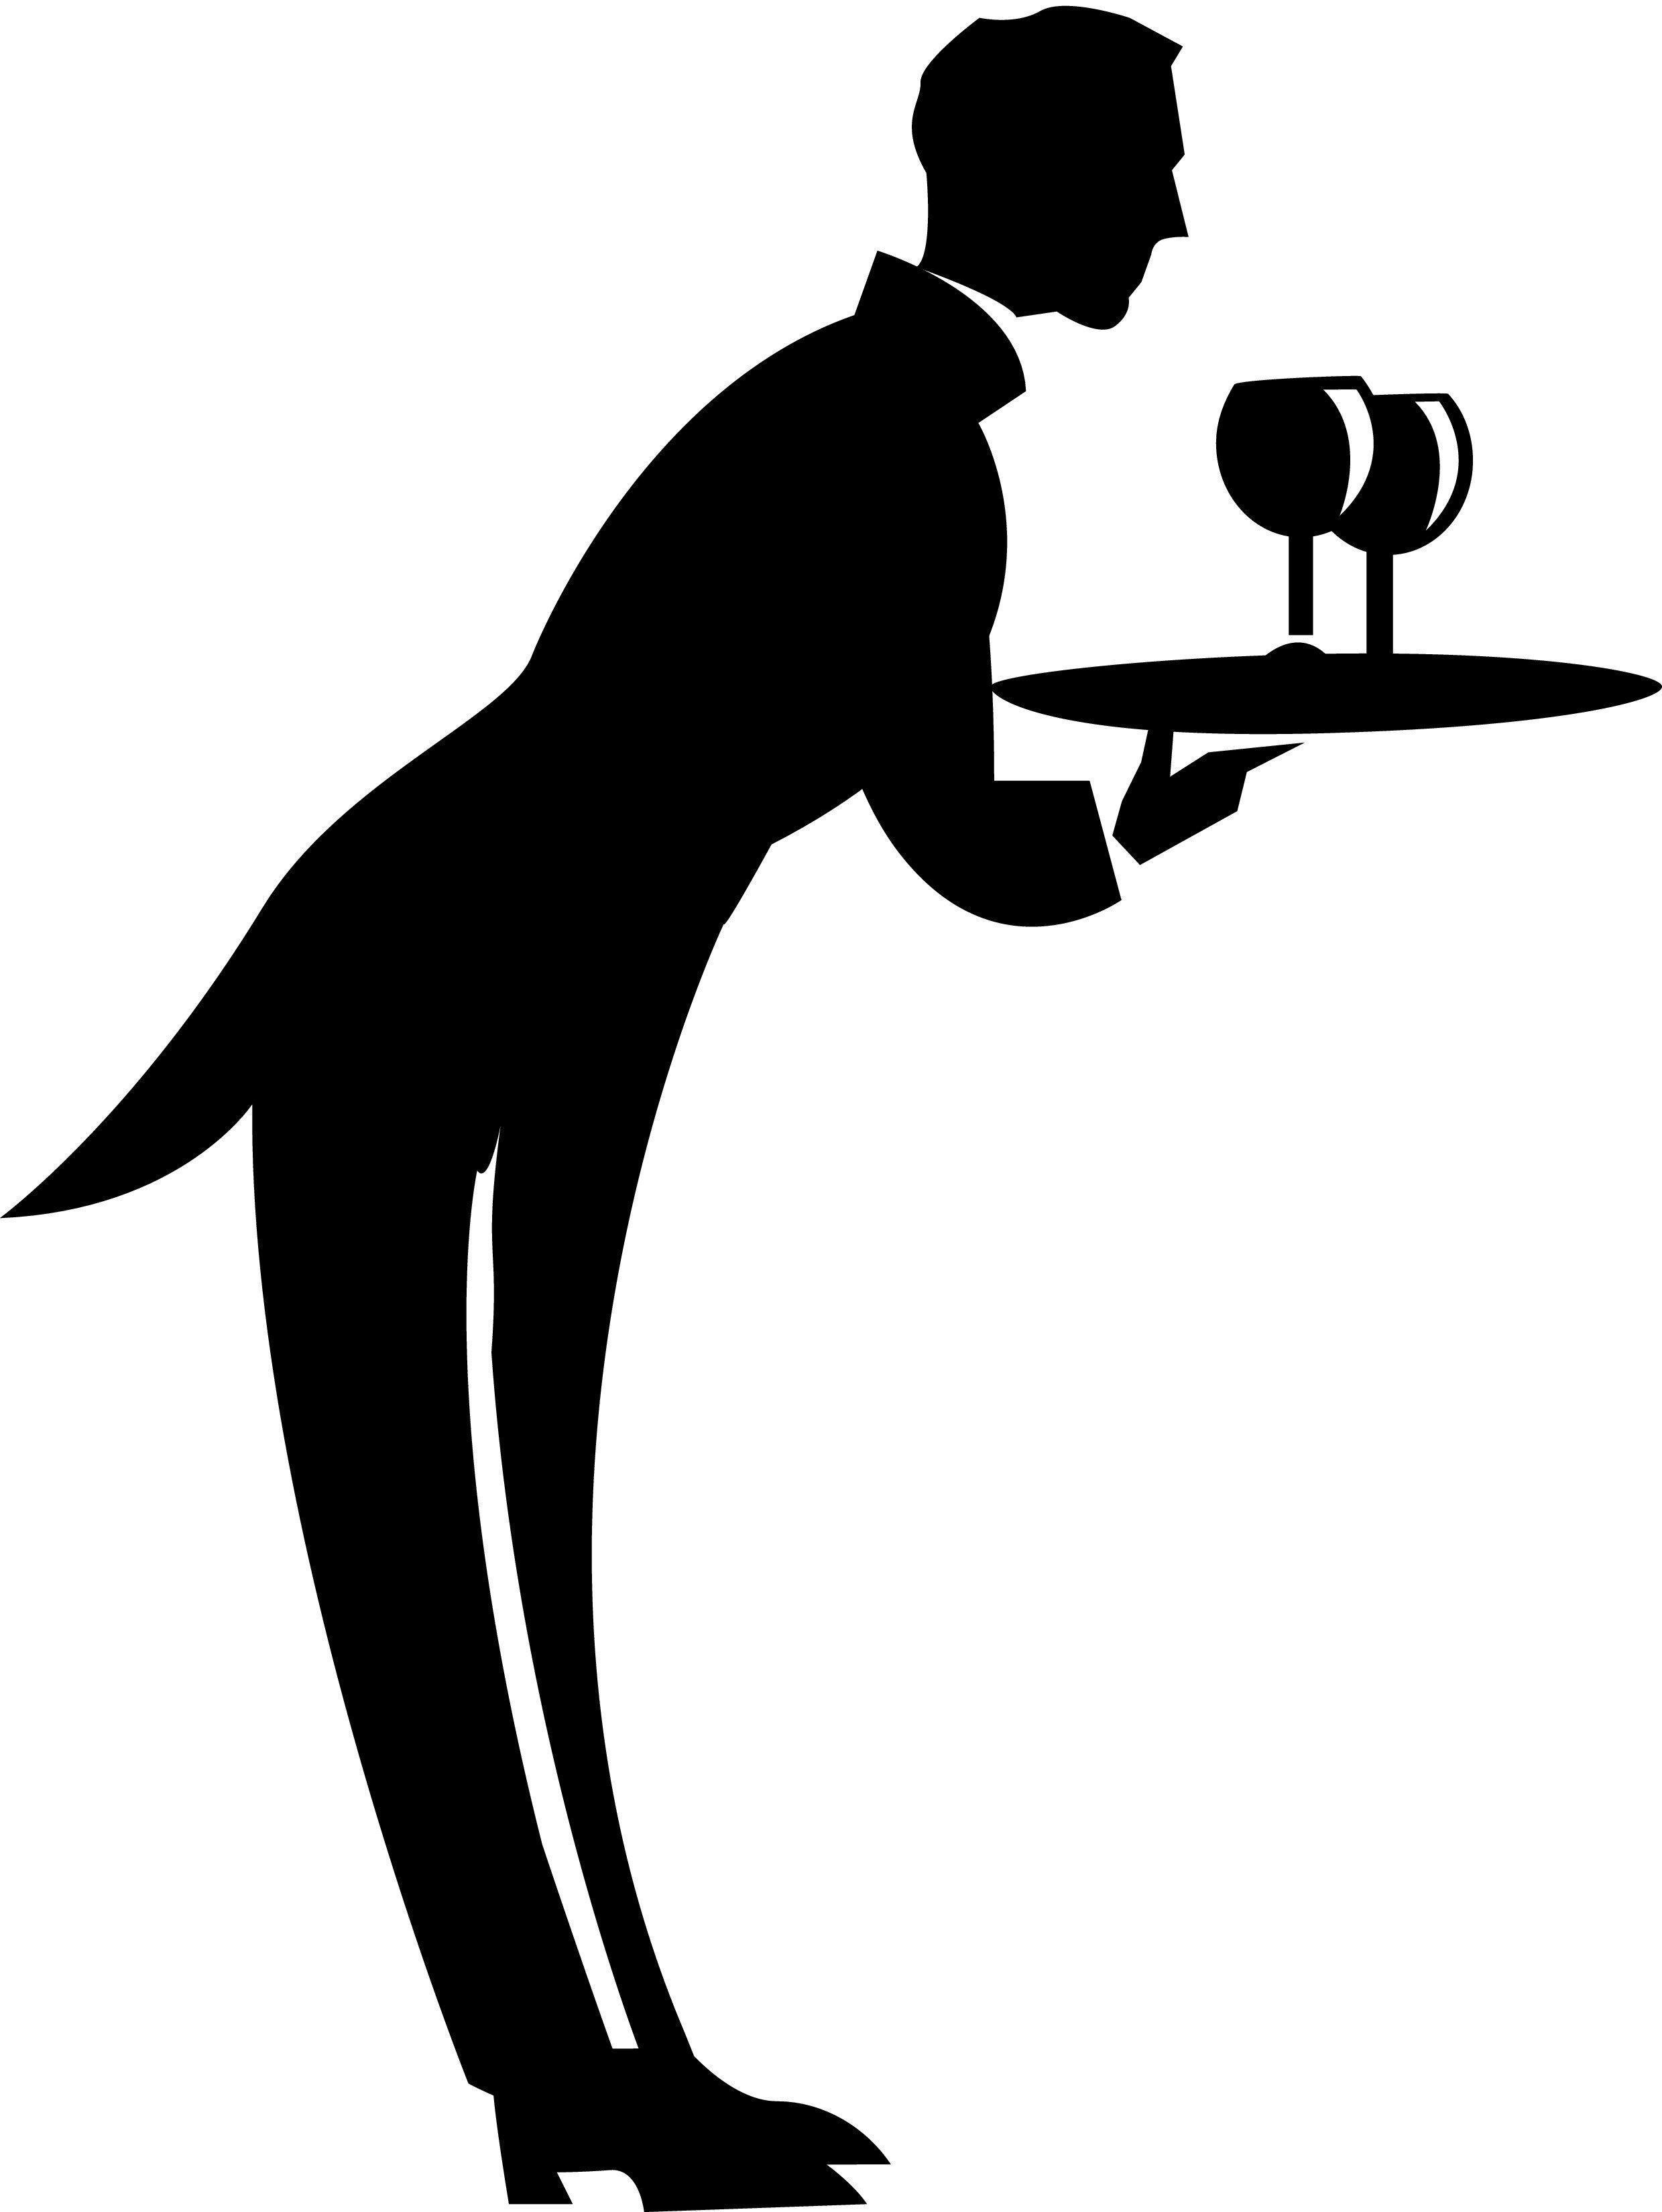 Waiter Silhouette